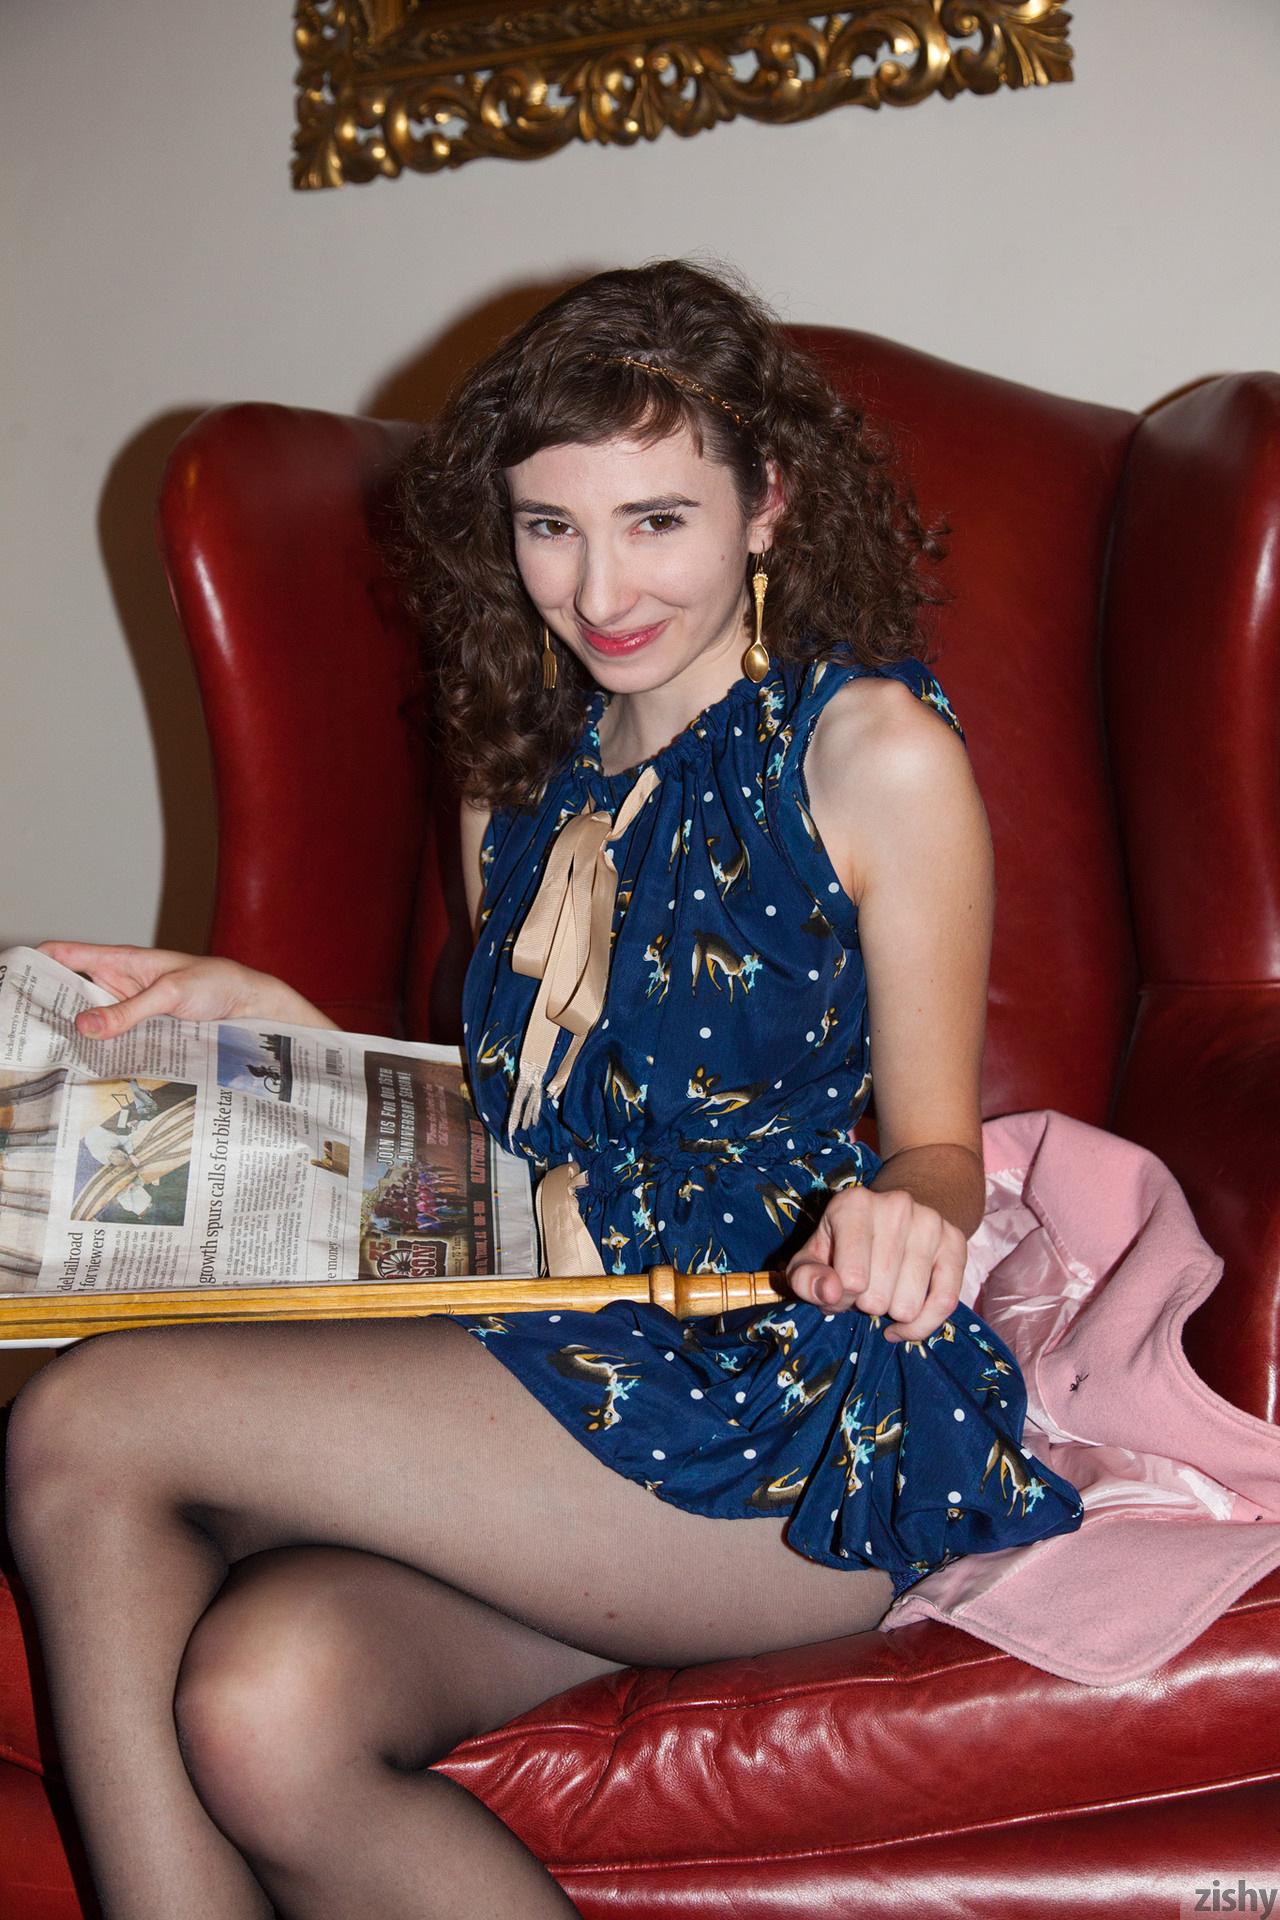 Yvette Nolot At Arizona Inn Zishy (16)